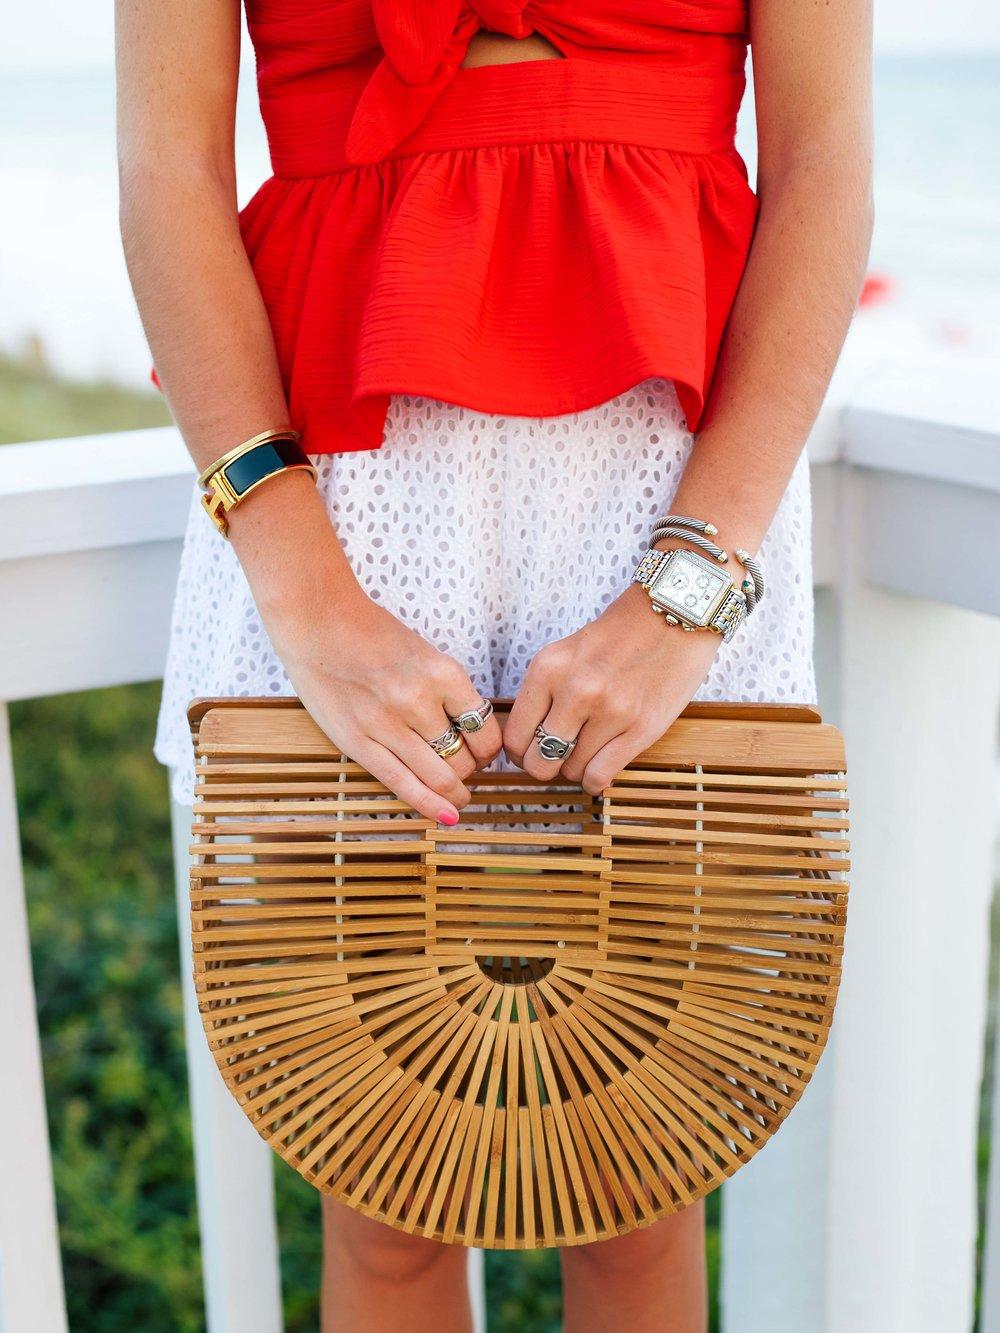 lcb style fashion blogger seaside florida beach fourth of july  (25 of 28) copy.jpg